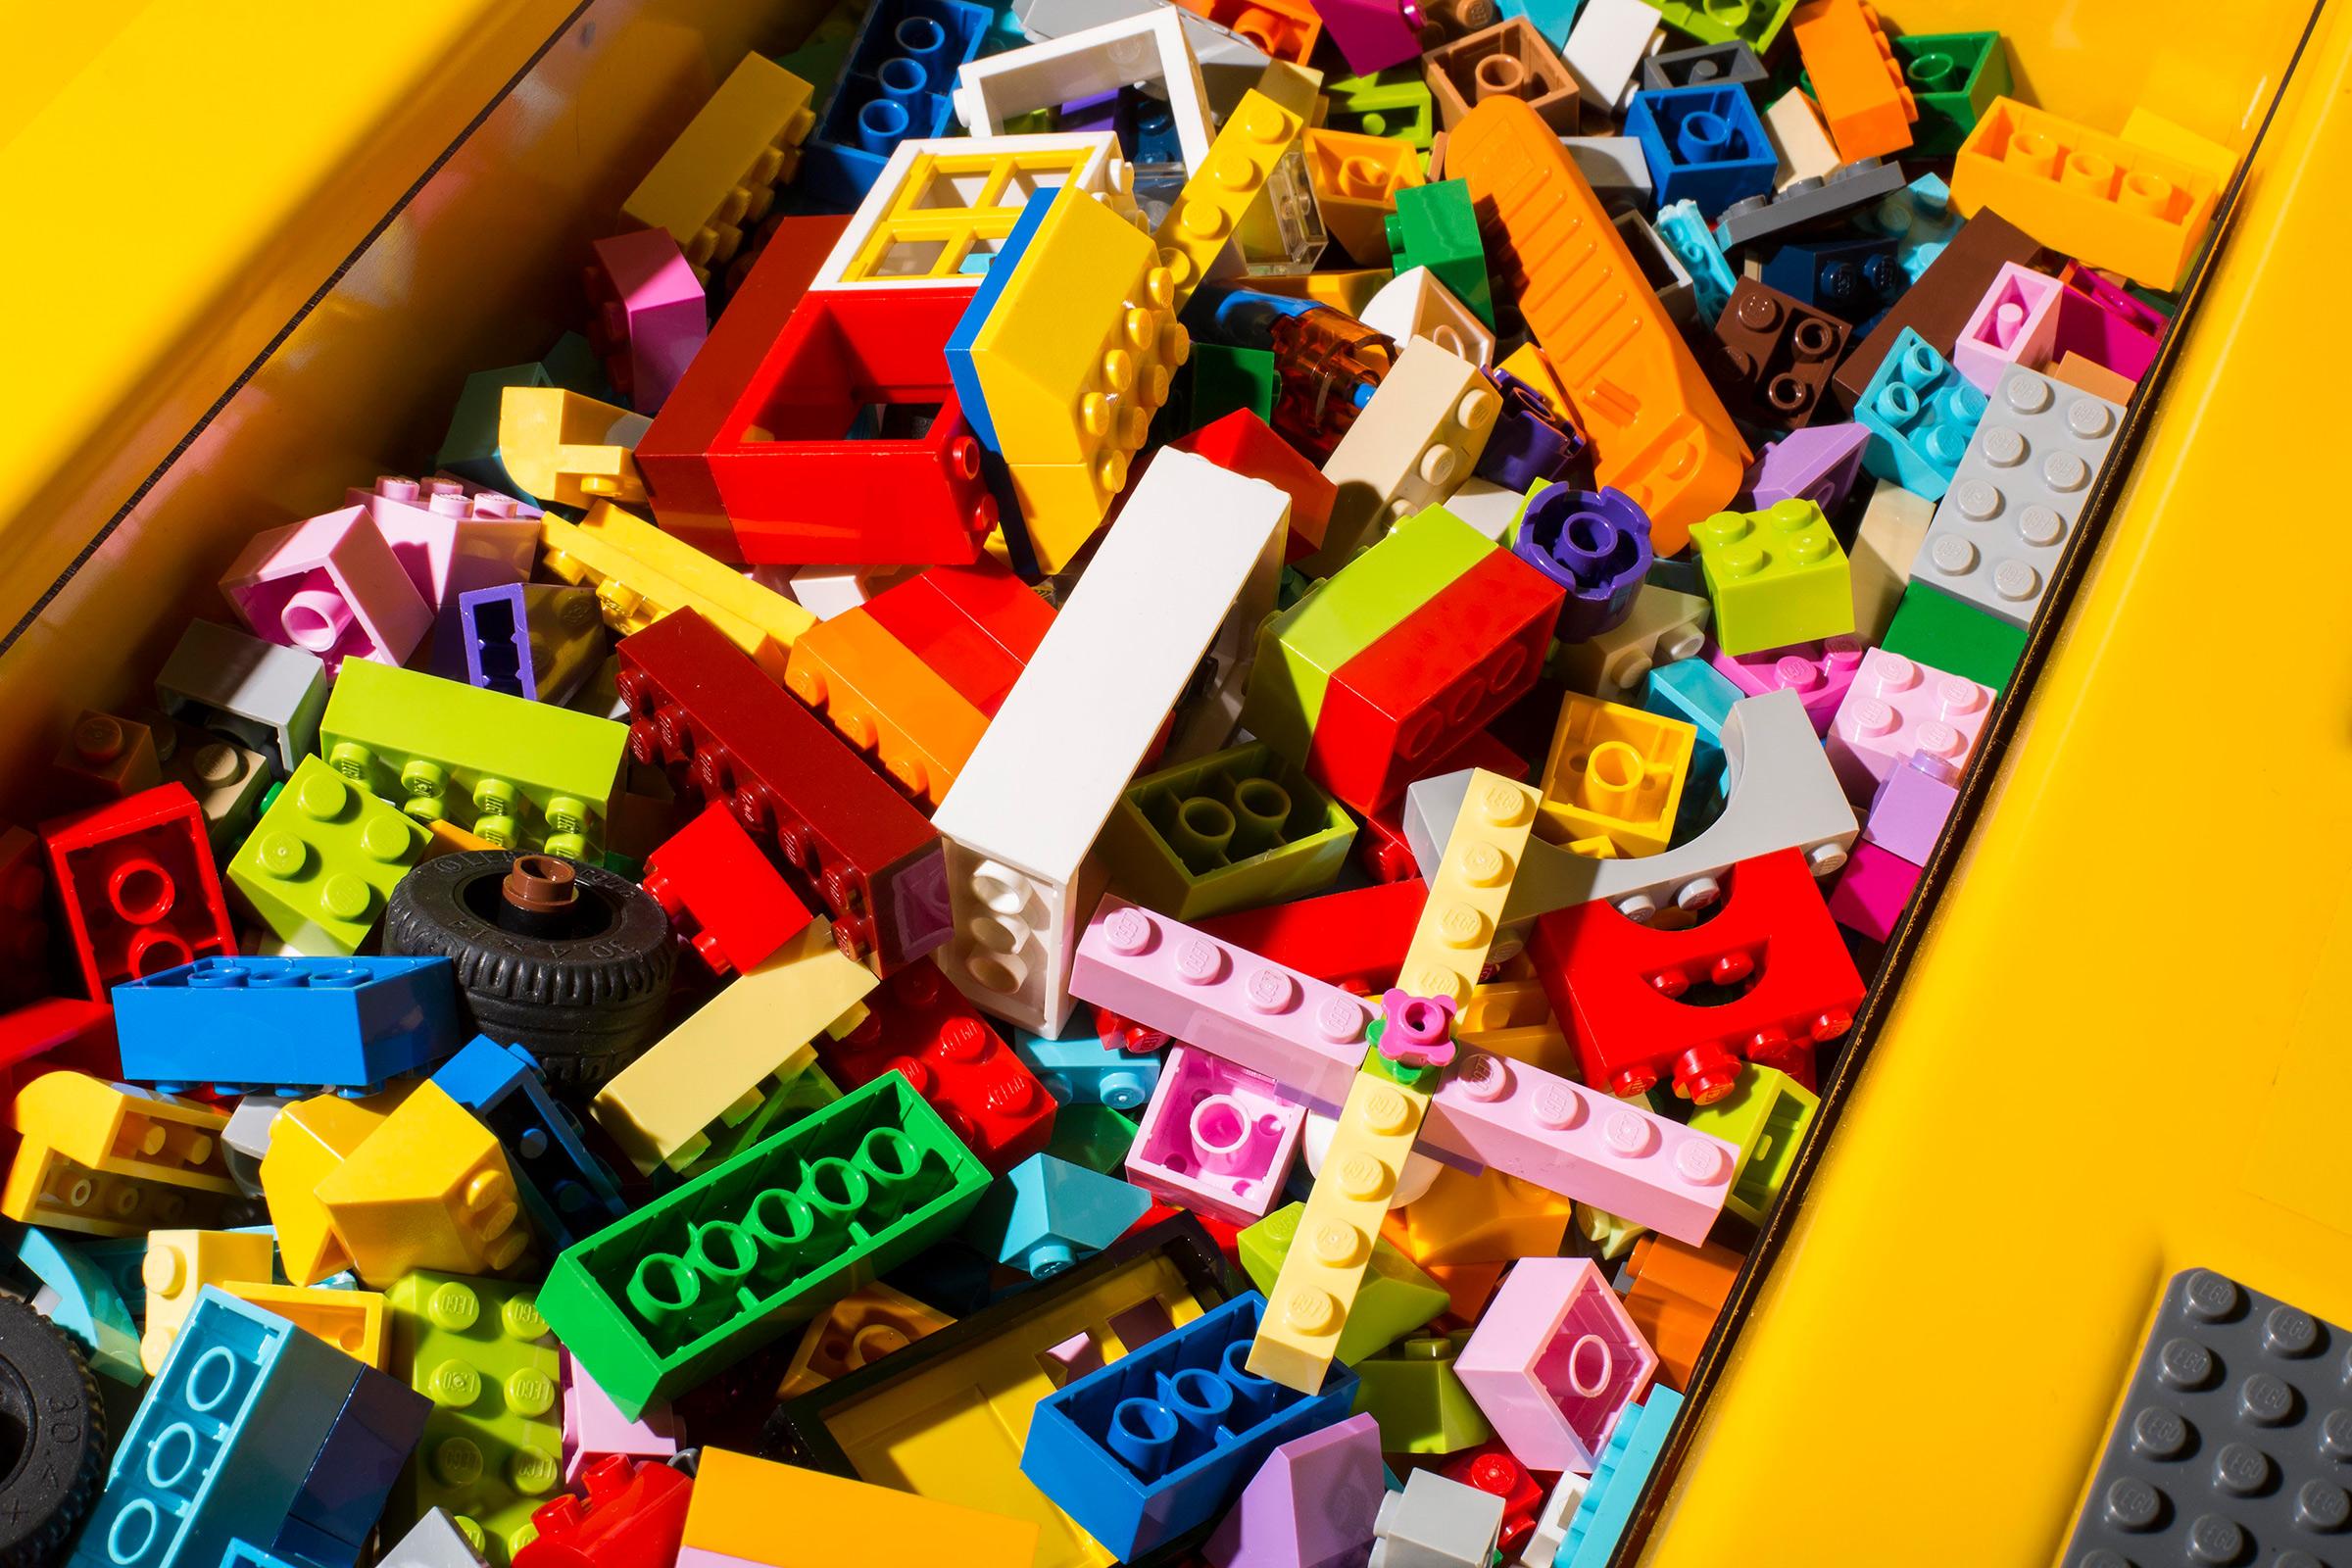 Legos on display at a store in Rockaway, N.J. on Oct. 1, 2018.